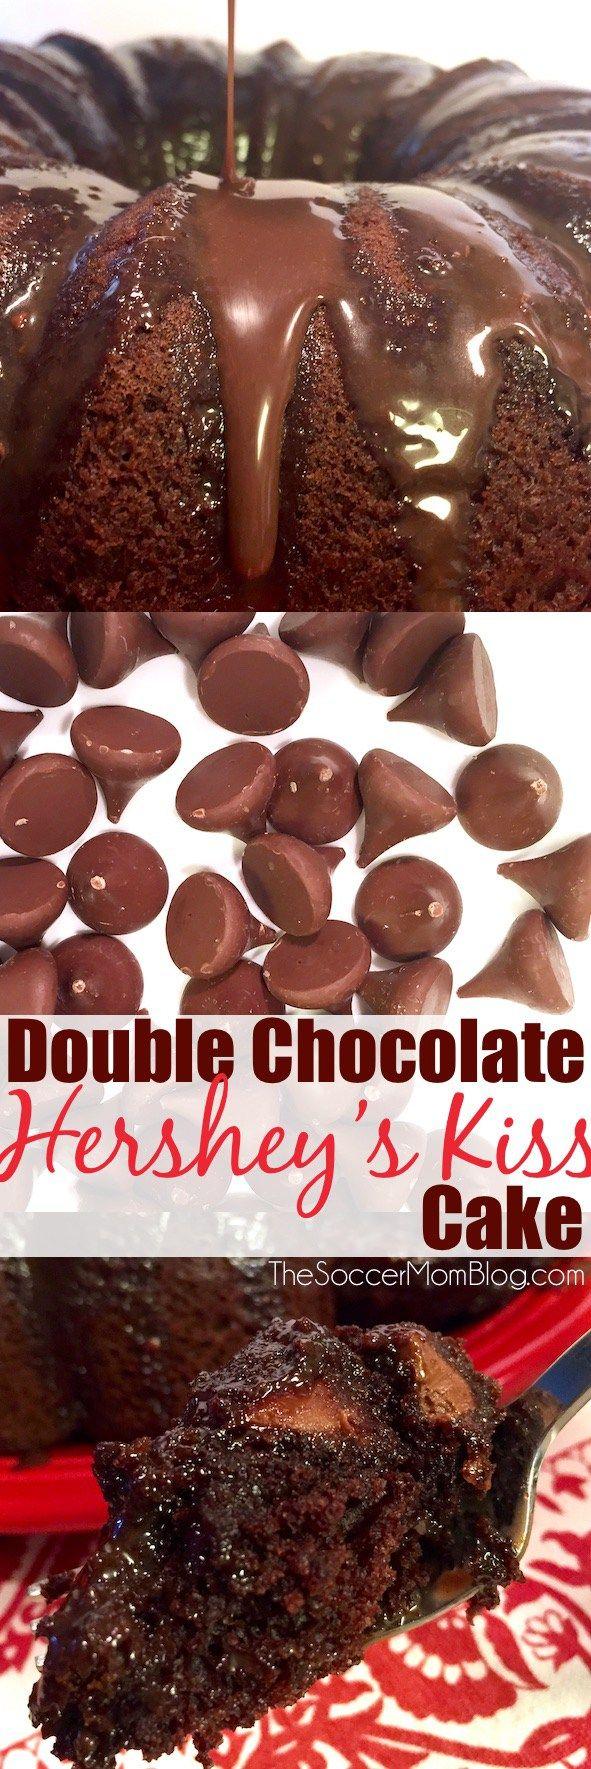 Double Chocolate Hershey's Kiss Cake   Recipe   Perfect chocolate ...